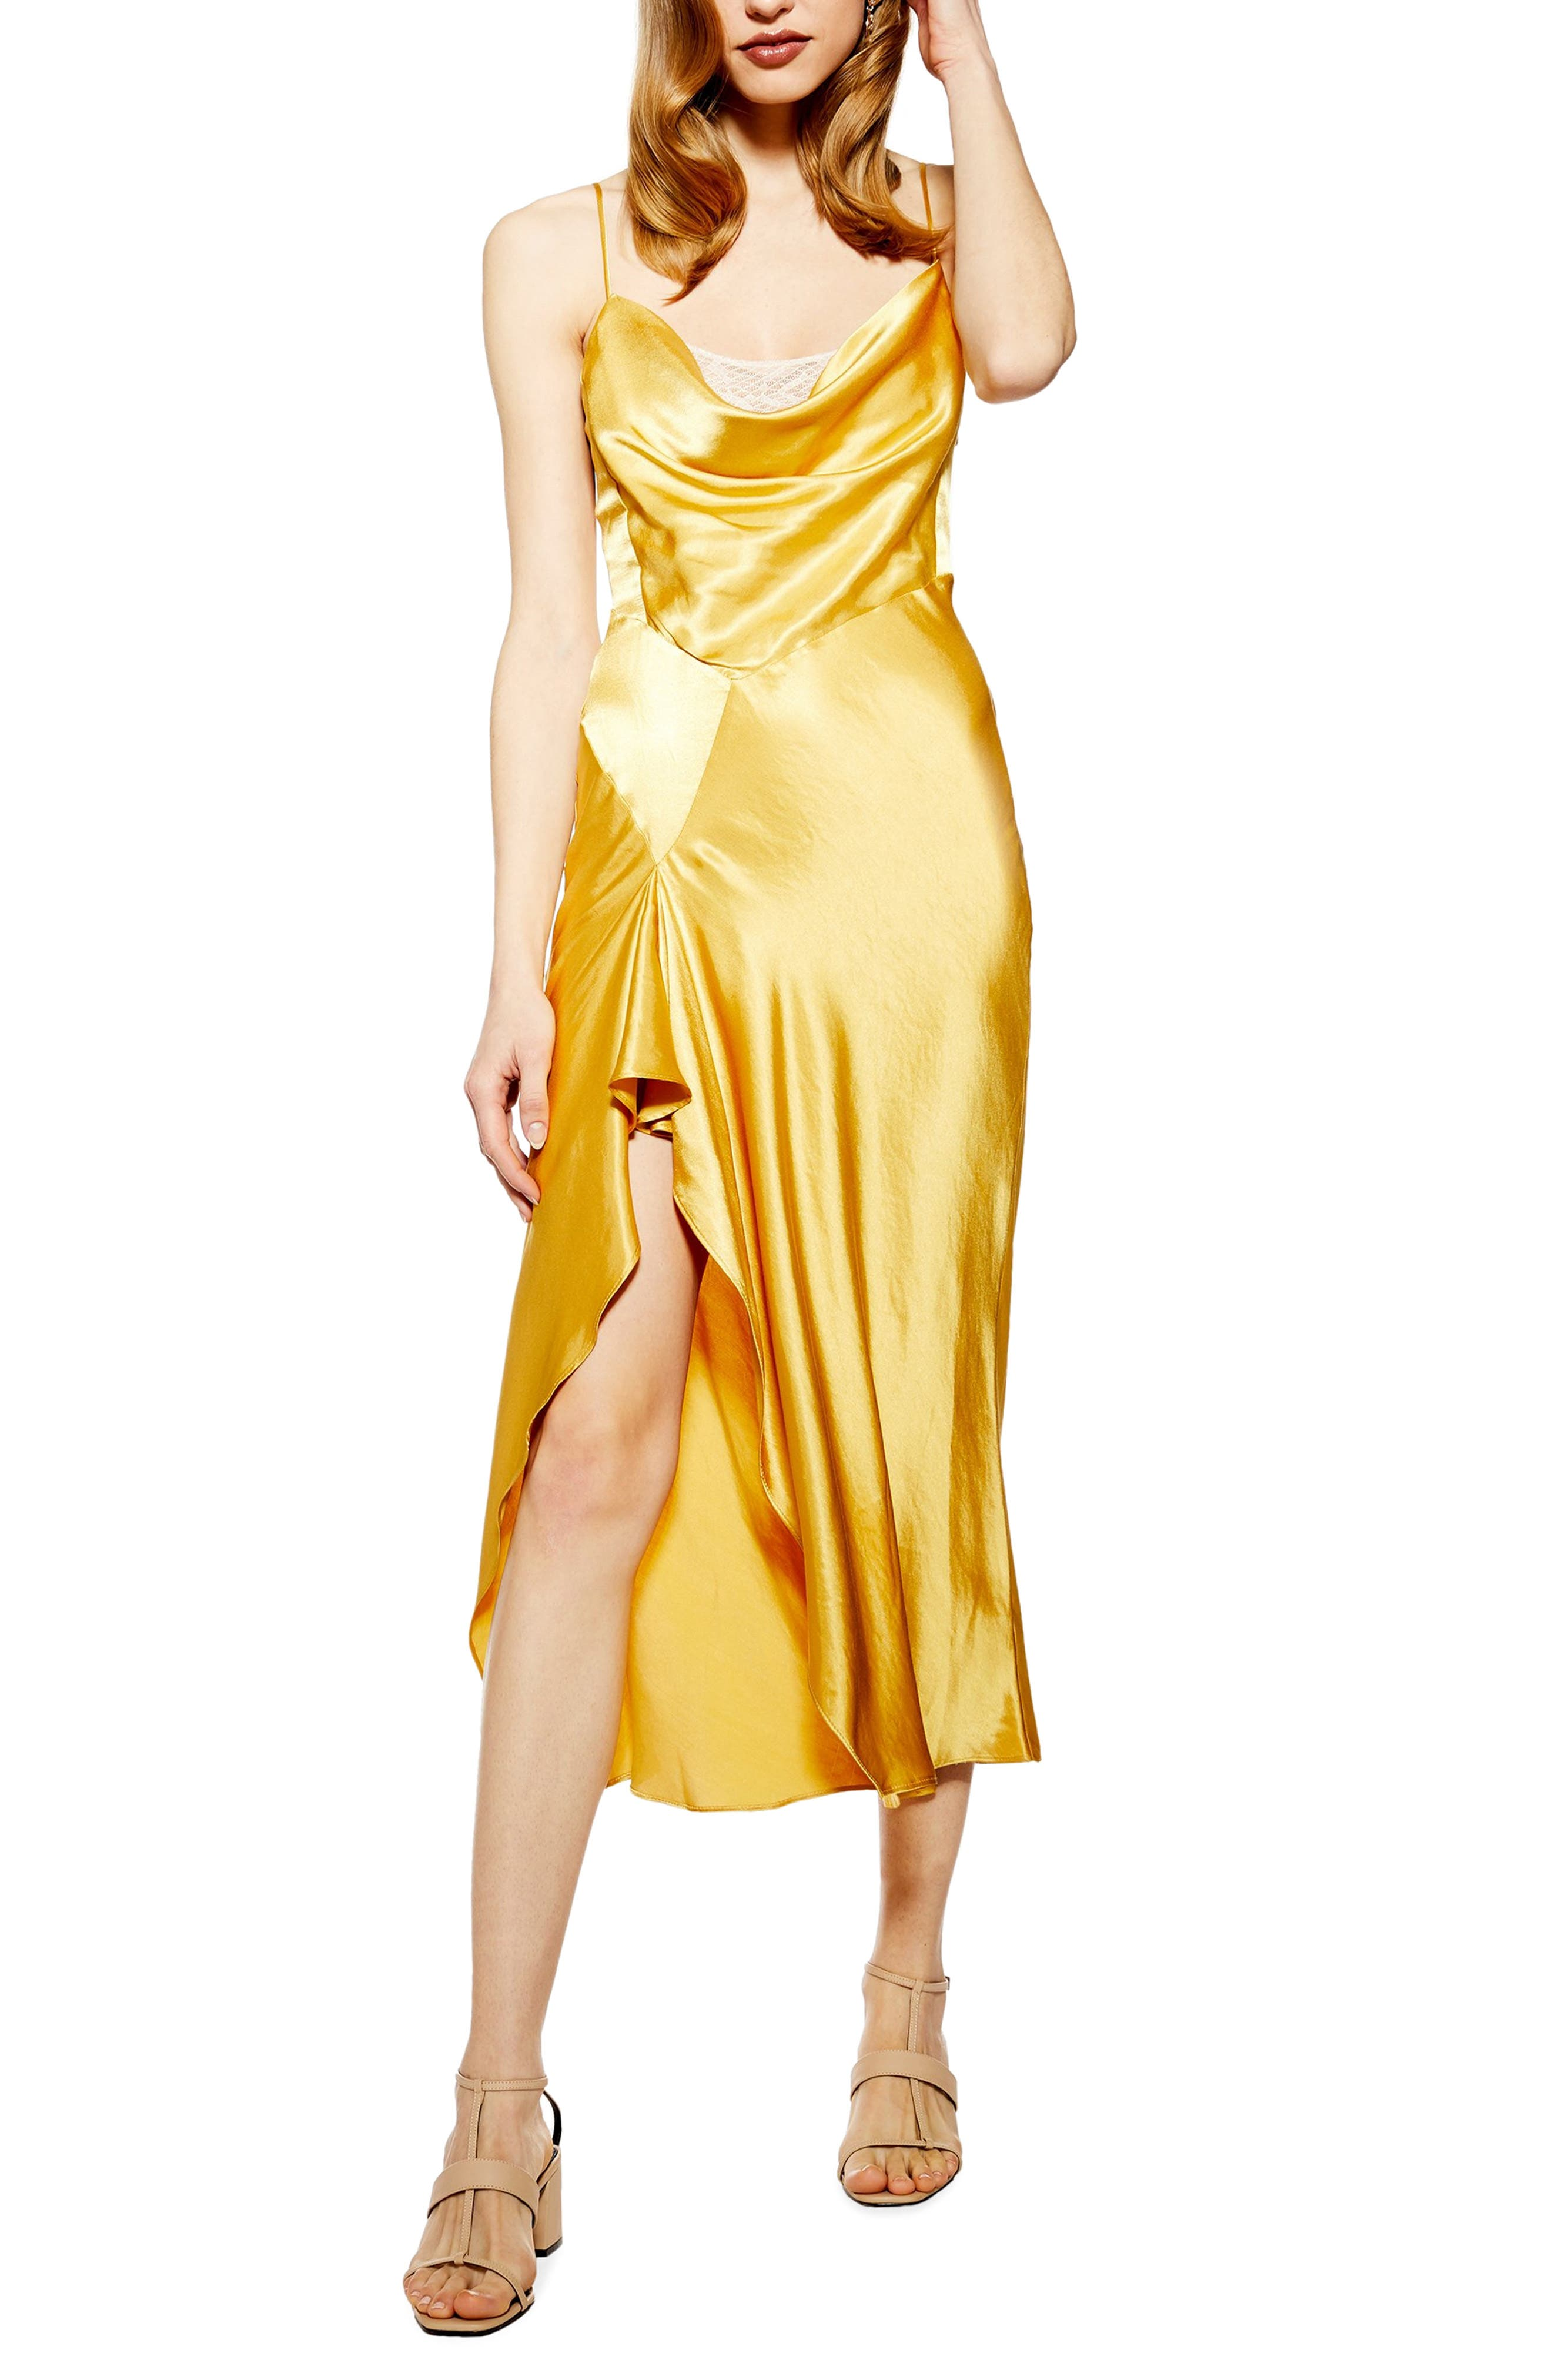 Topshop Lace Back Satin Slipdress, US (fits like 2-4) - Yellow